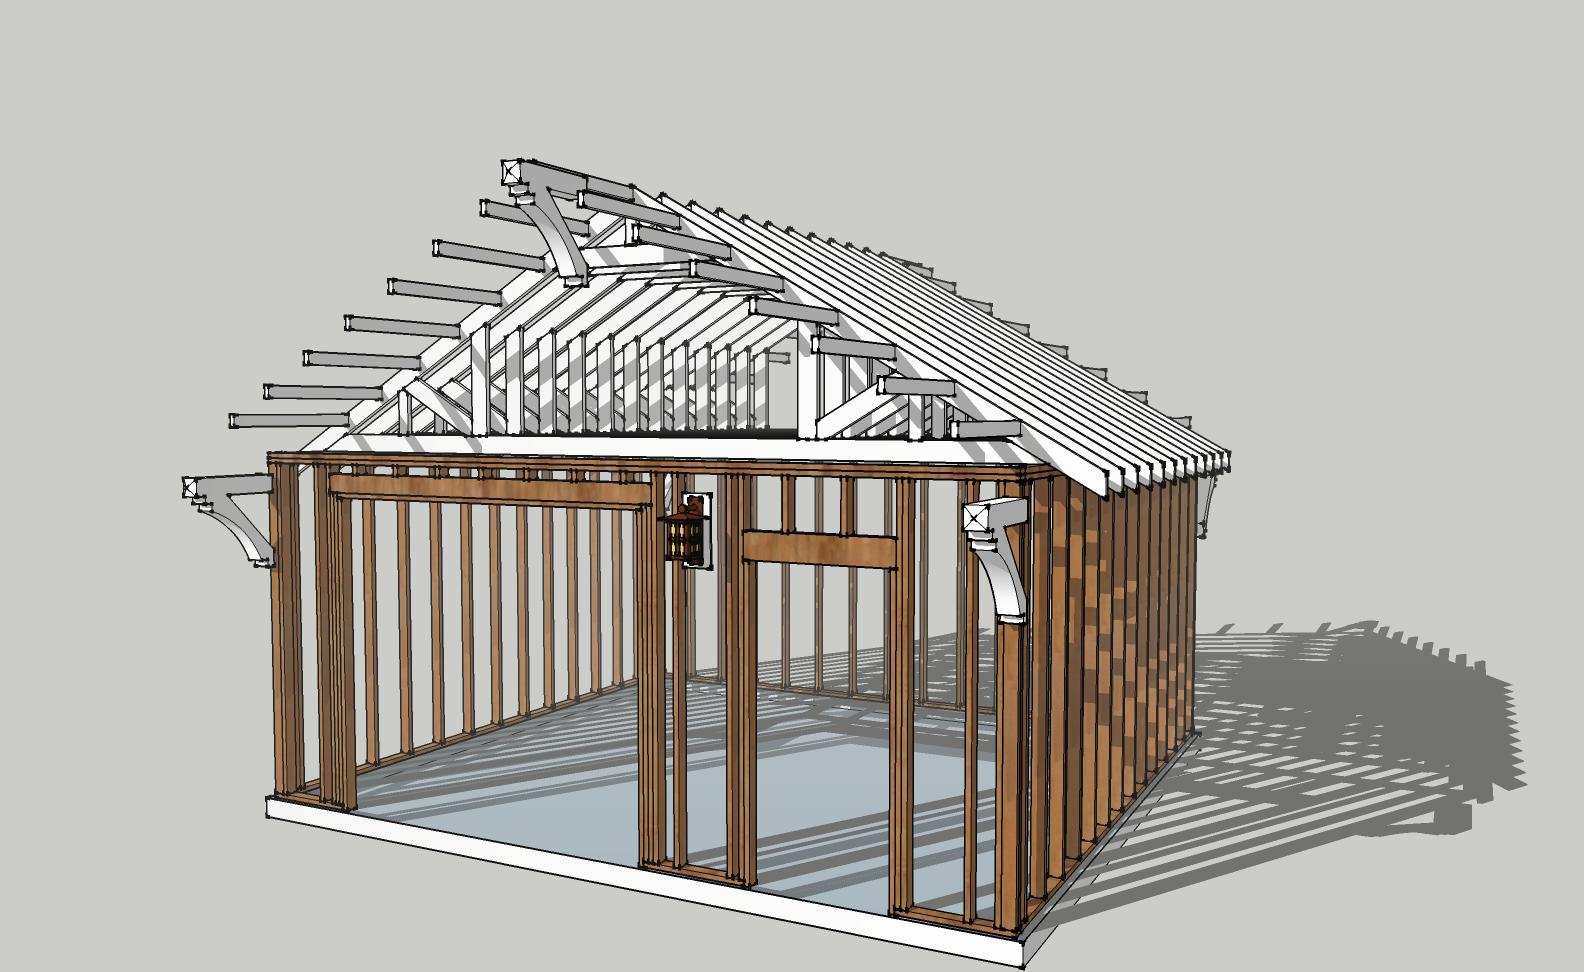 Dormer Bungalow Floor Plans Plans To Build Garage Framing Plans Pdf Plans